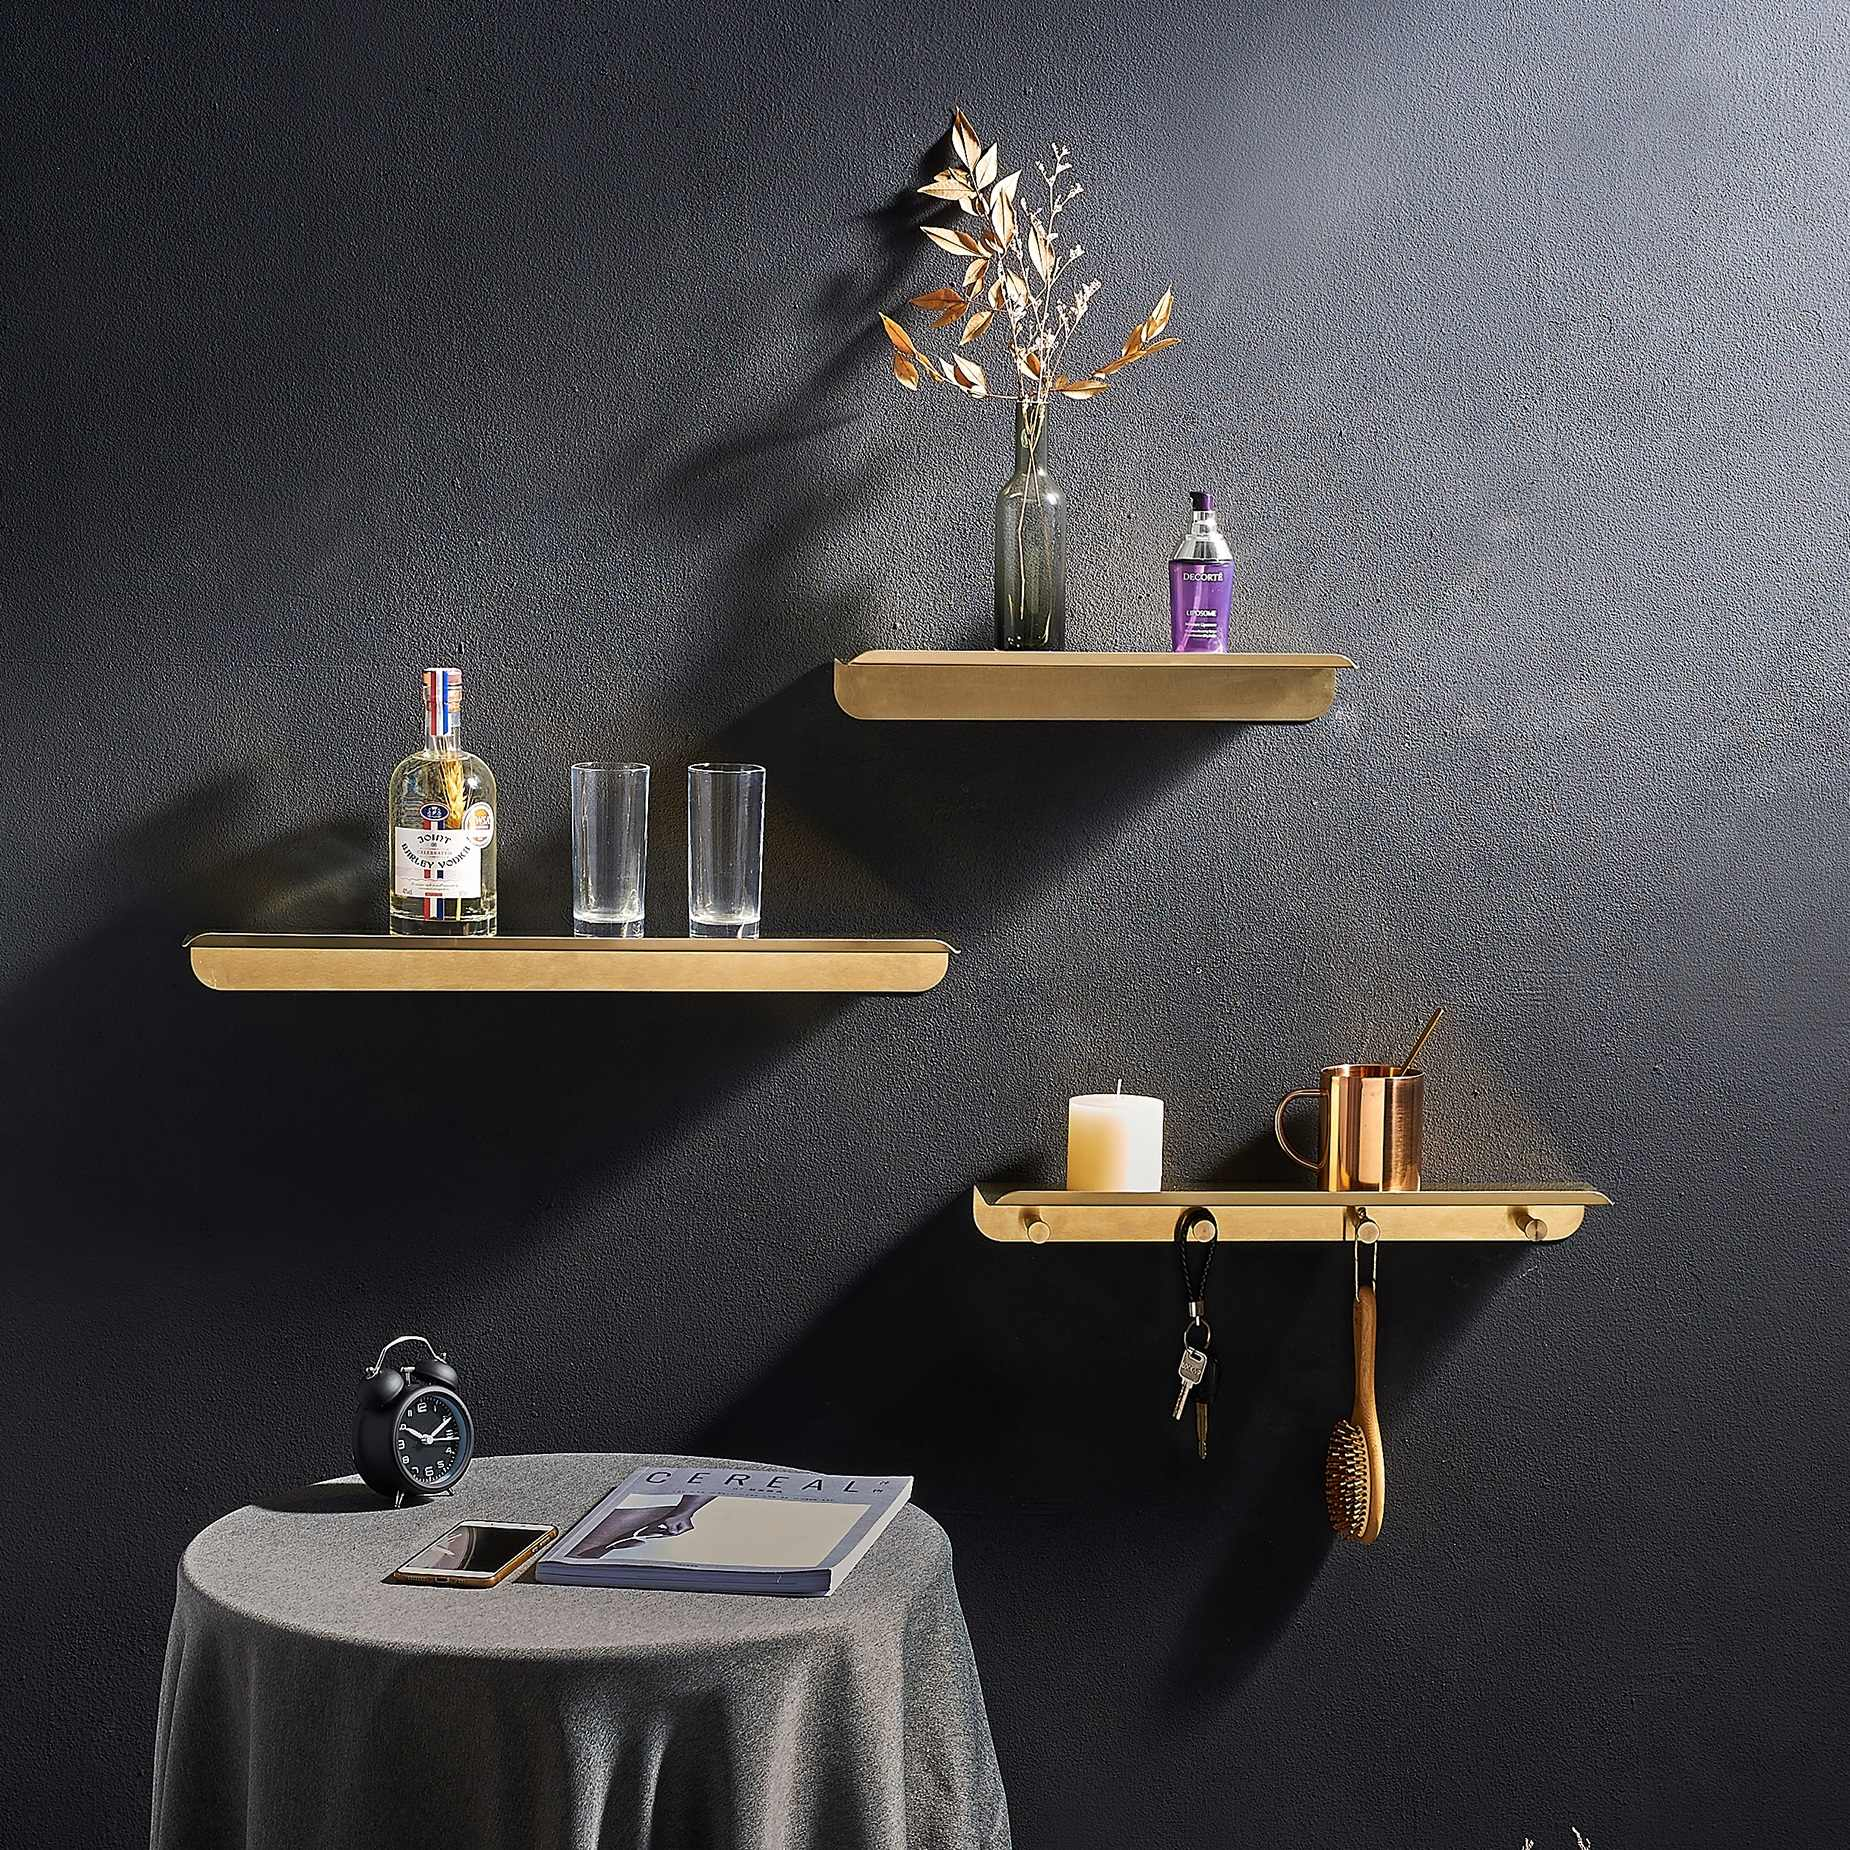 Image of: Floating Shelves Stainless Steel 304 Trays Bookshelves Display Modern Bedroom Wall Mounted Metal Storage Shelf Simple Design Decorative Shelves Aliexpress